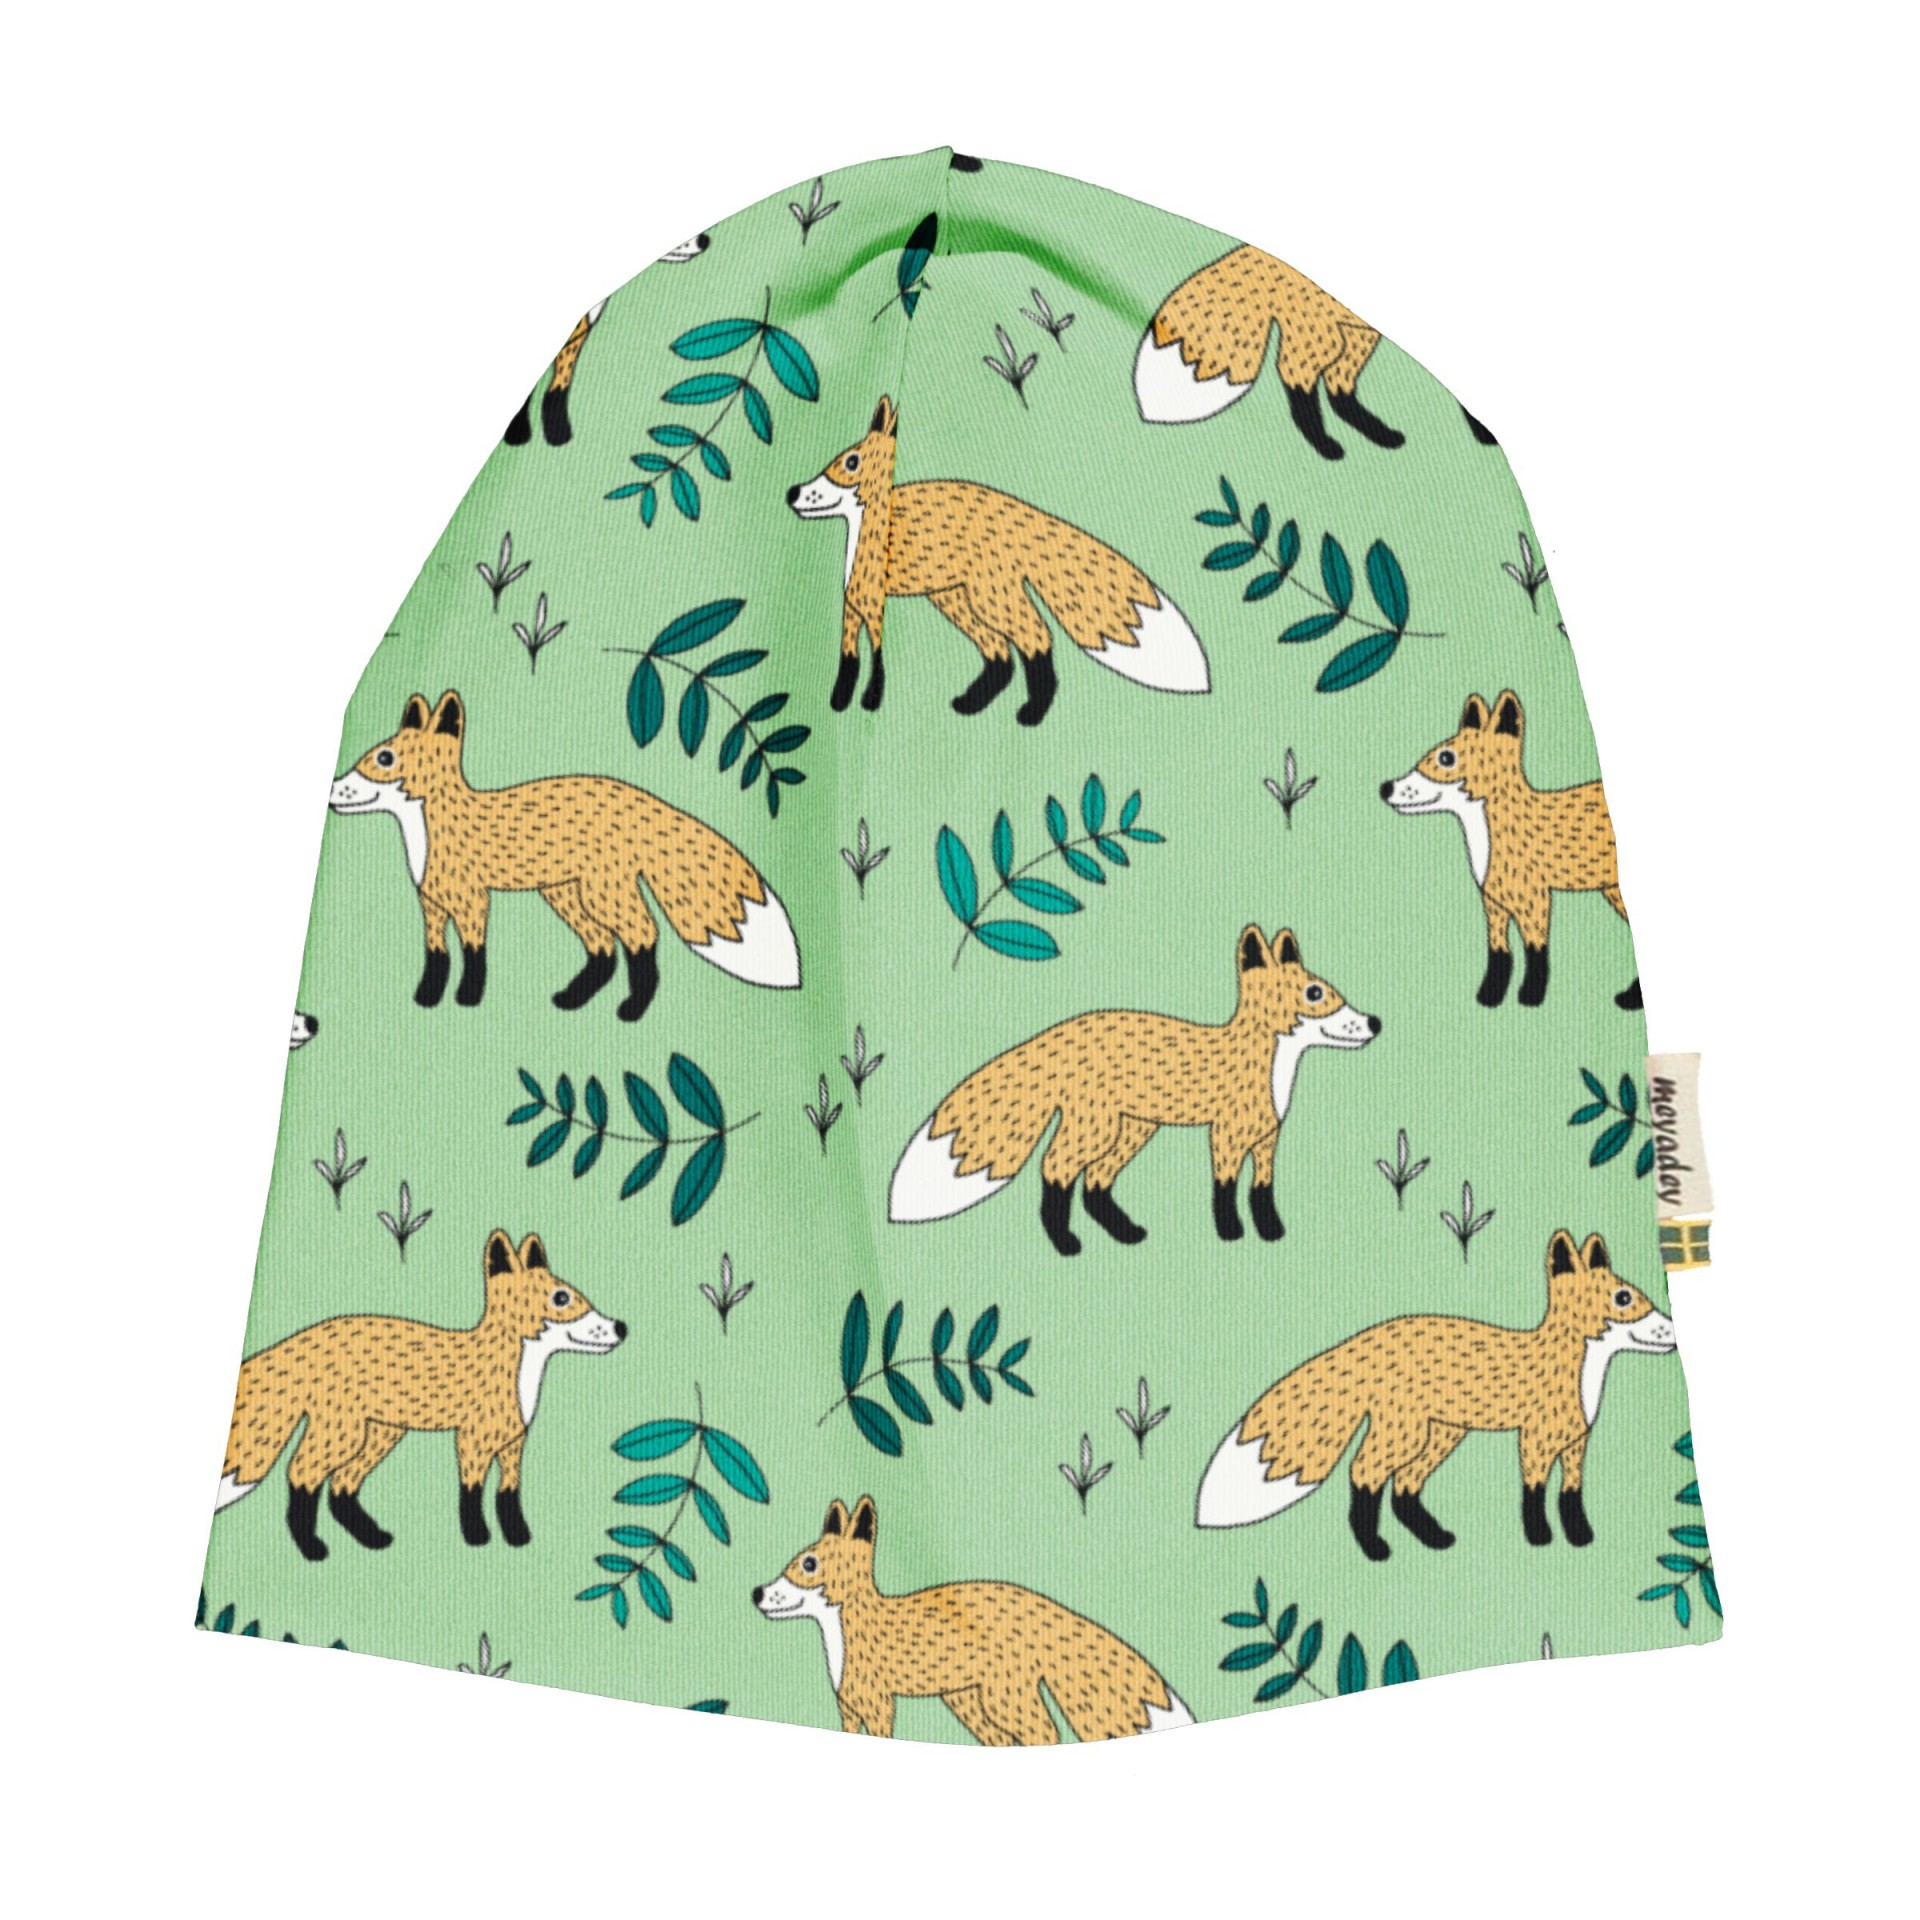 Gorro Wild Fox Meyaday (Tamanhos disponíveis 44, 48 e 56)